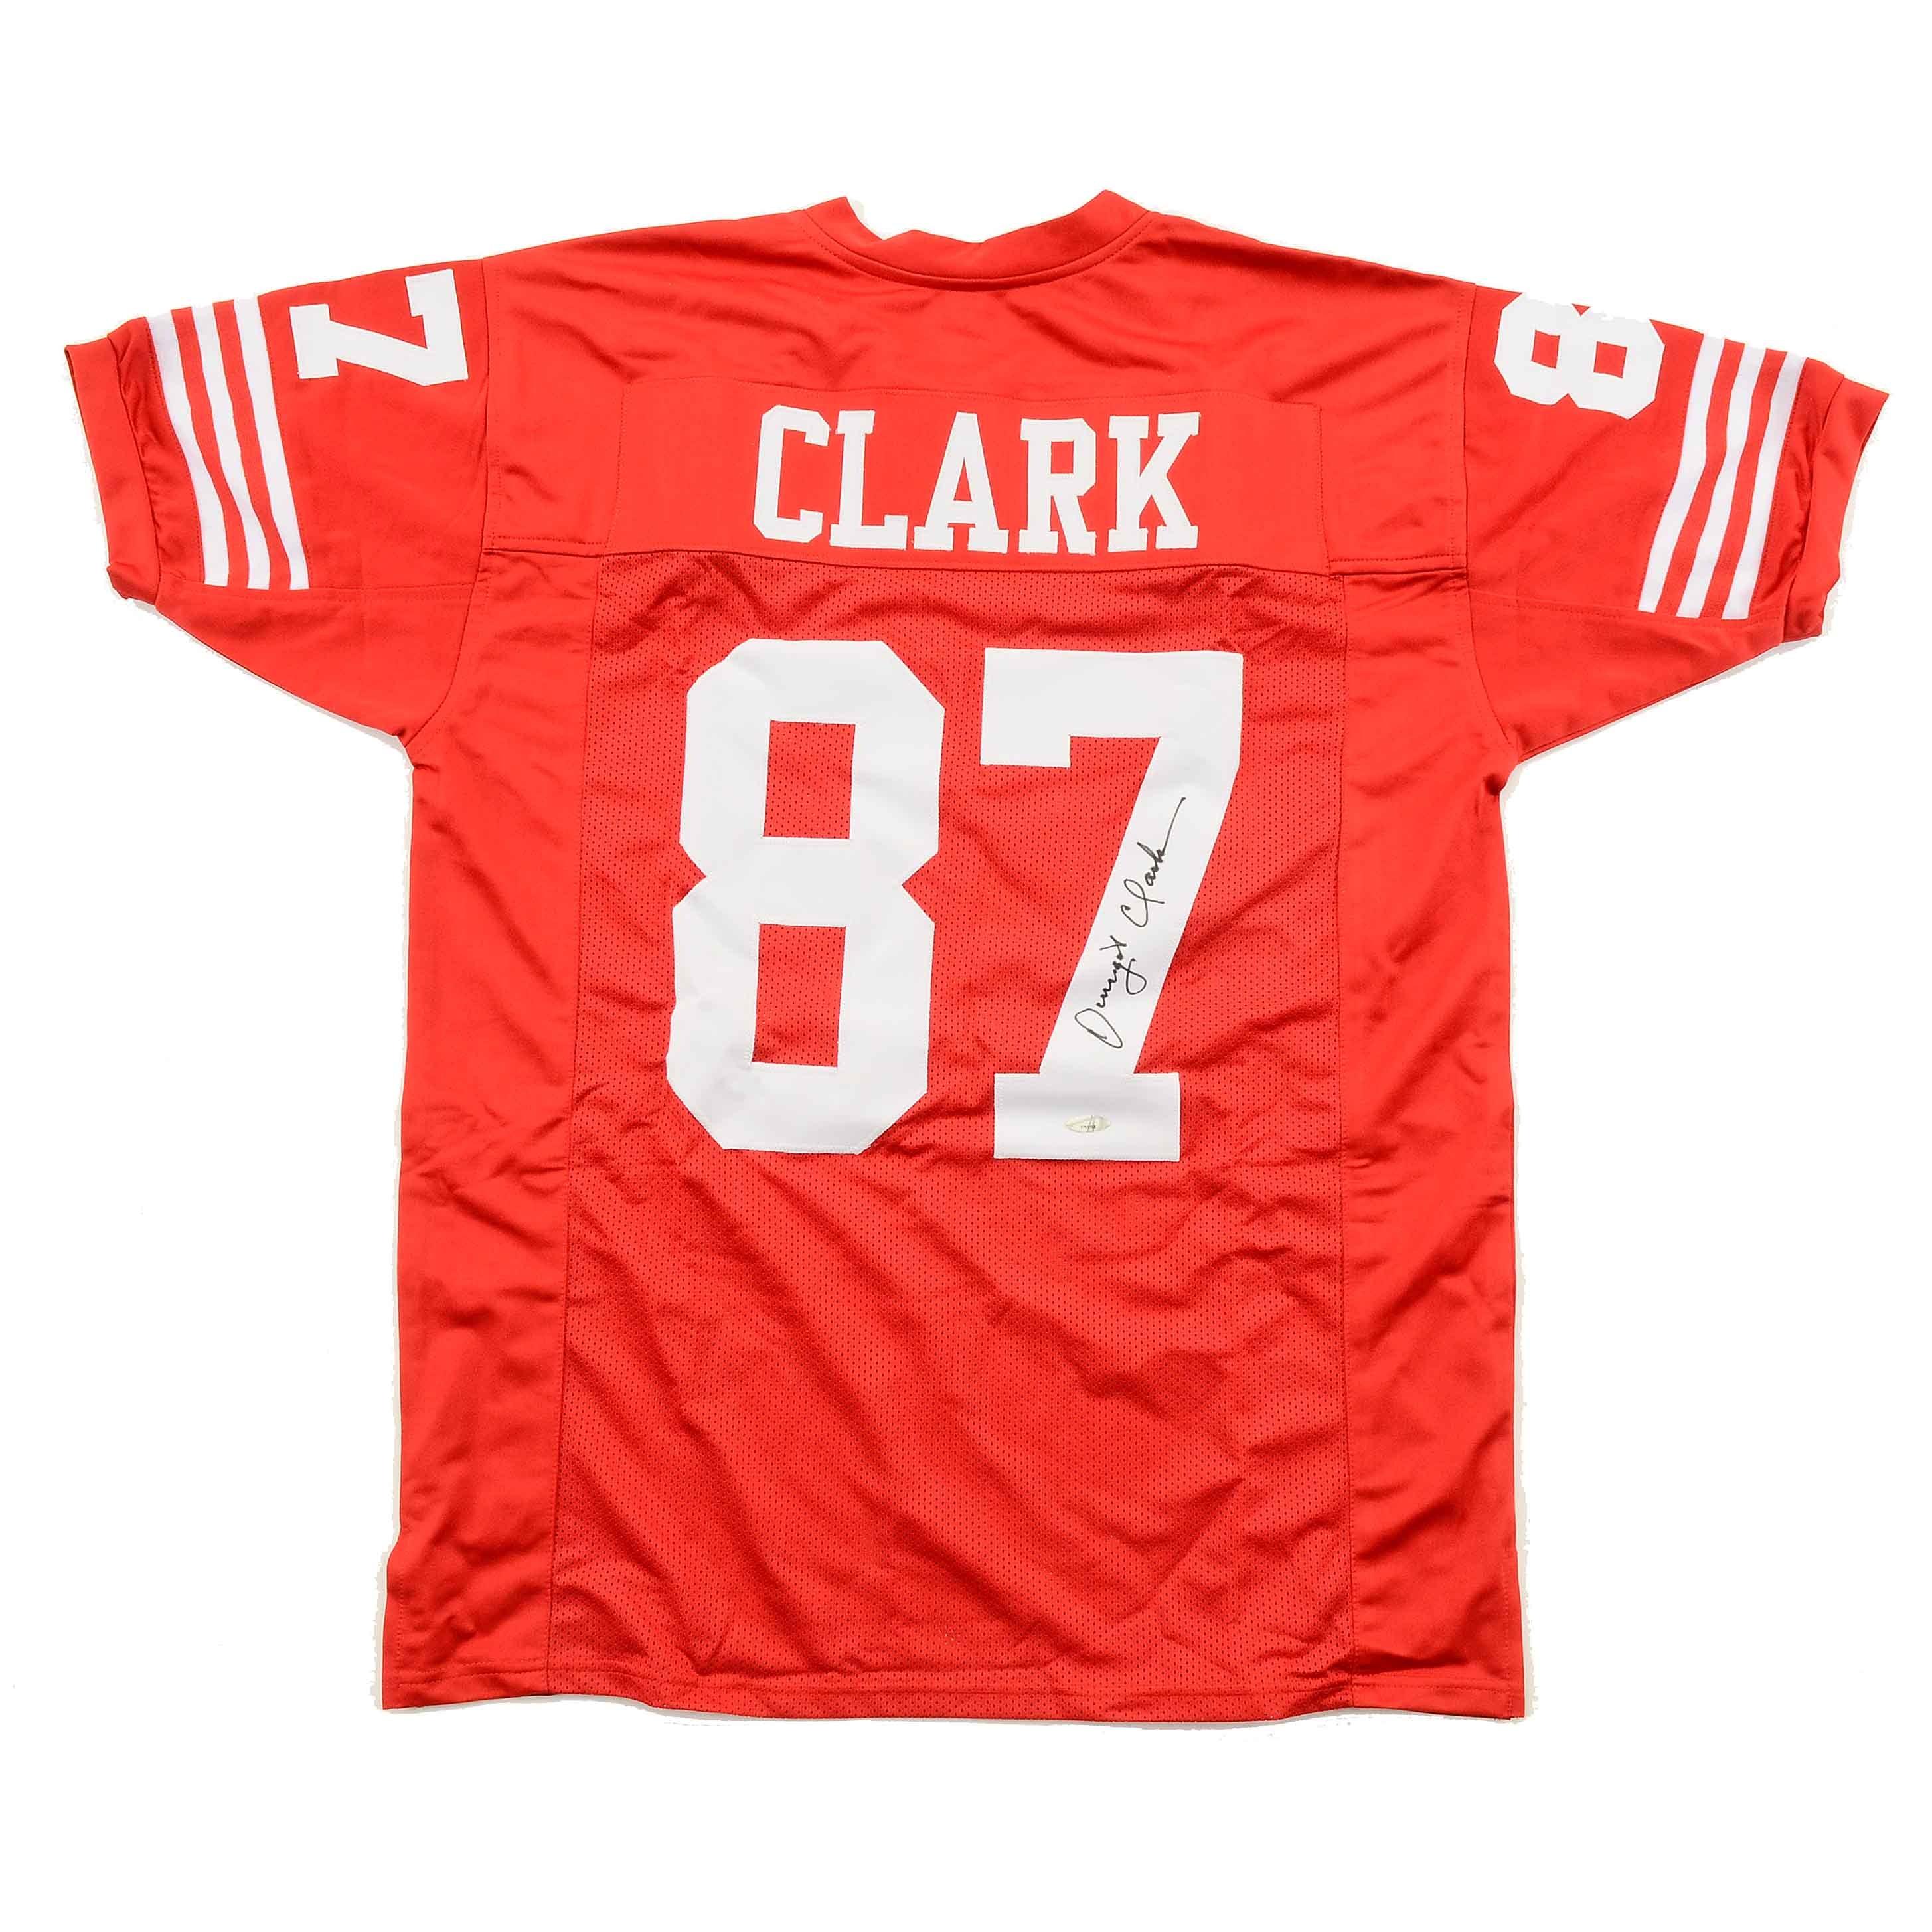 Dwight Clark Autographed San Fransisco 49ers Jersey Tr-Star COA